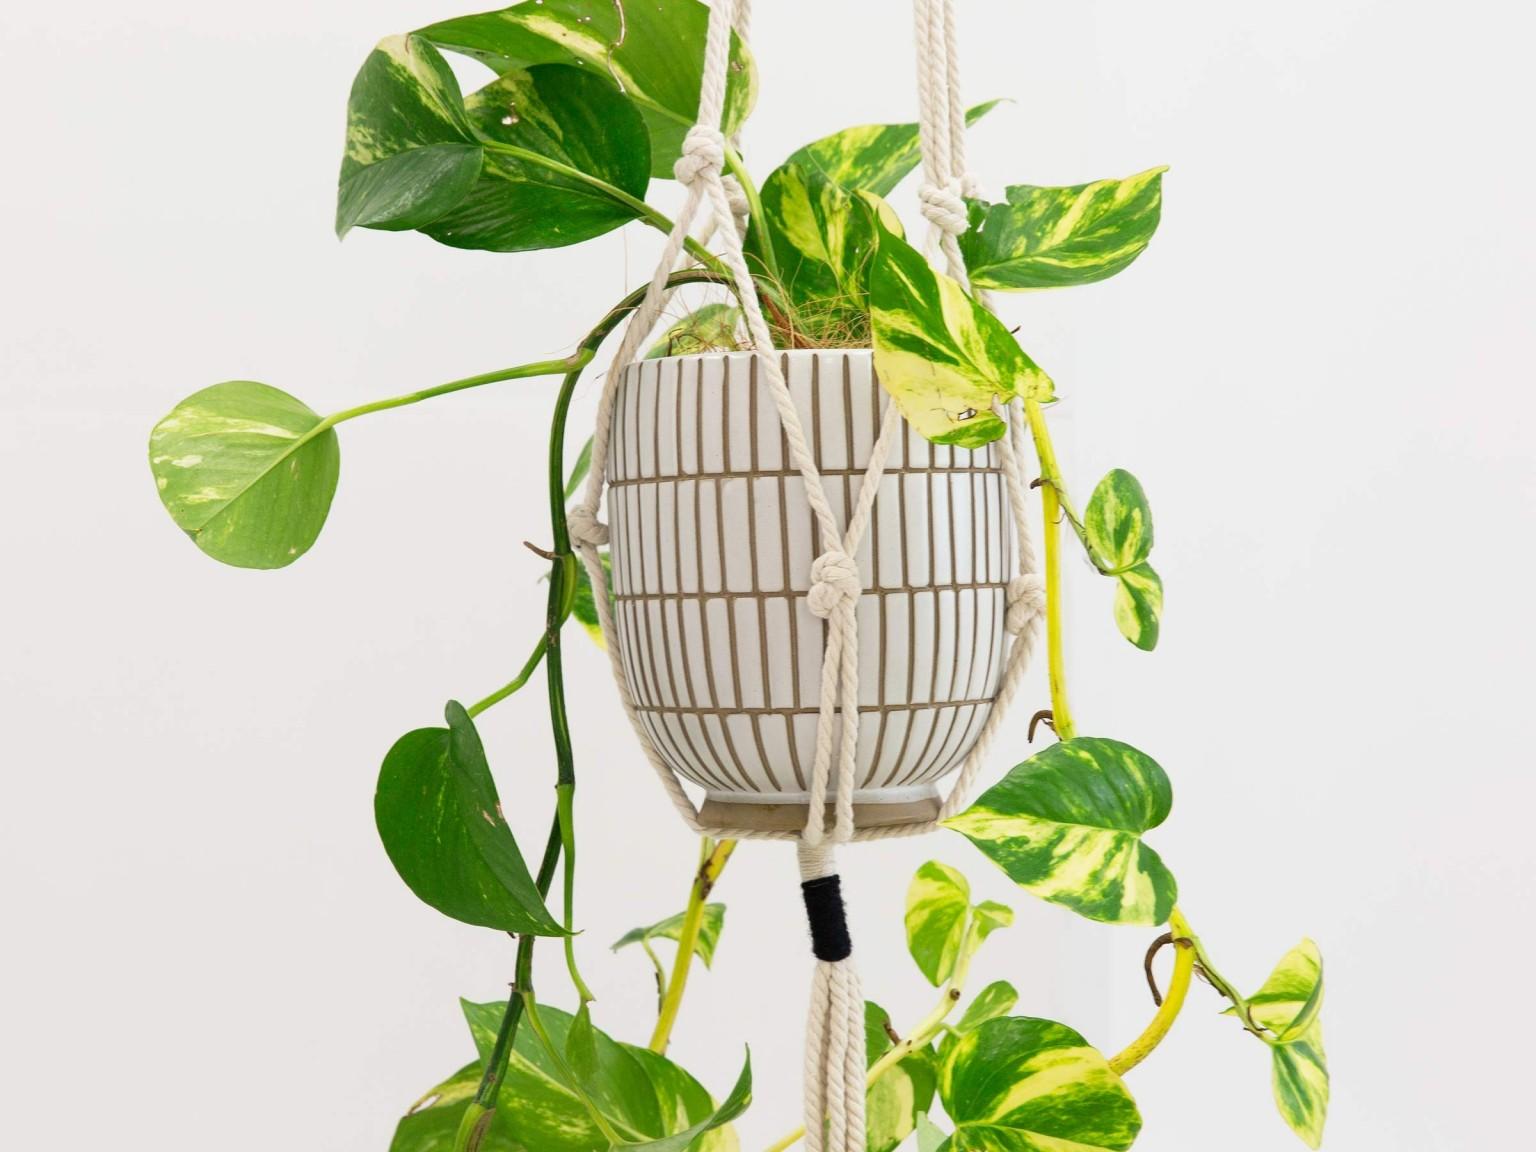 leo plant hanger 0d 1536x1152